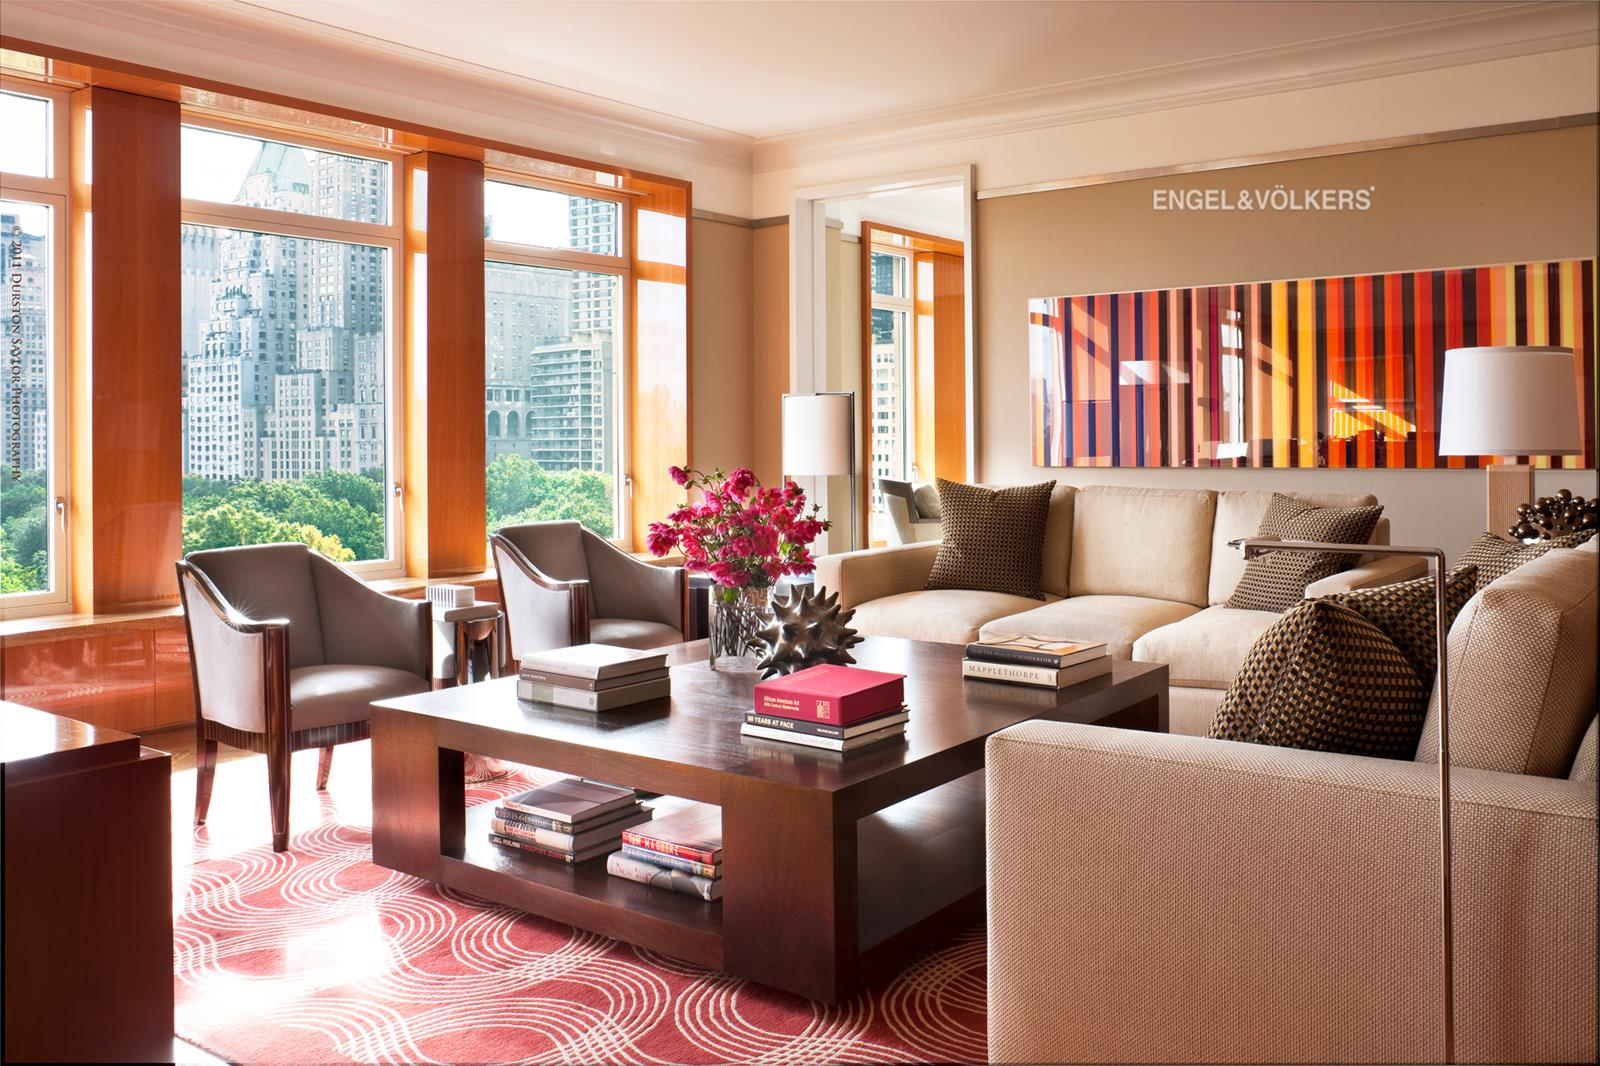 Condominium for Sale at 15 Central Park West 11-B 15 Central Park West New York, New York 10023 United States